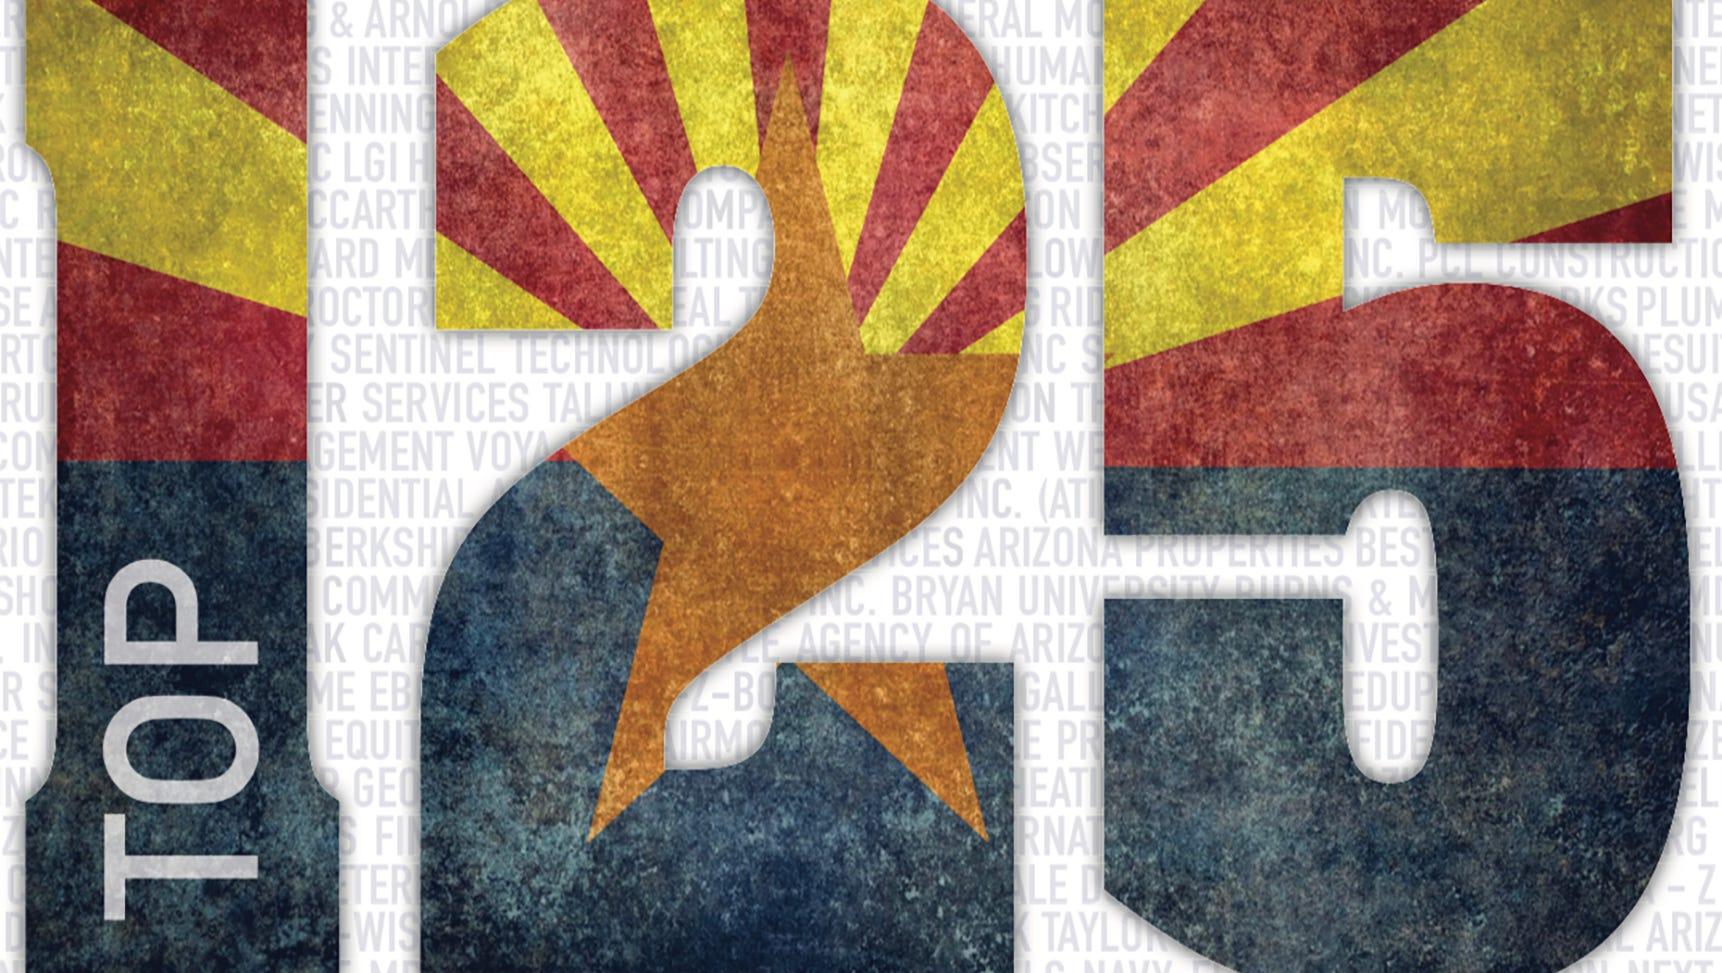 Top Companies To Work For In Arizona Medium Companies